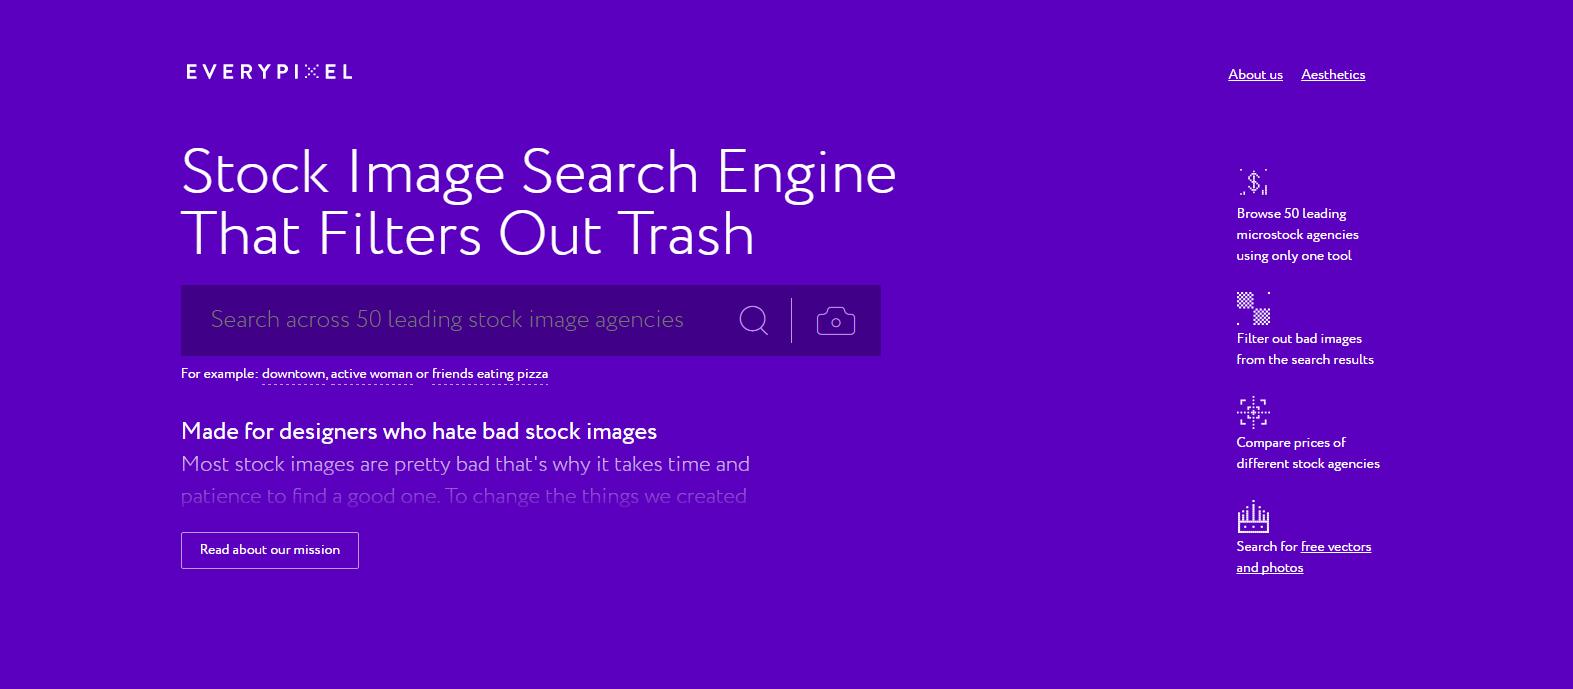 everypixel-homepage